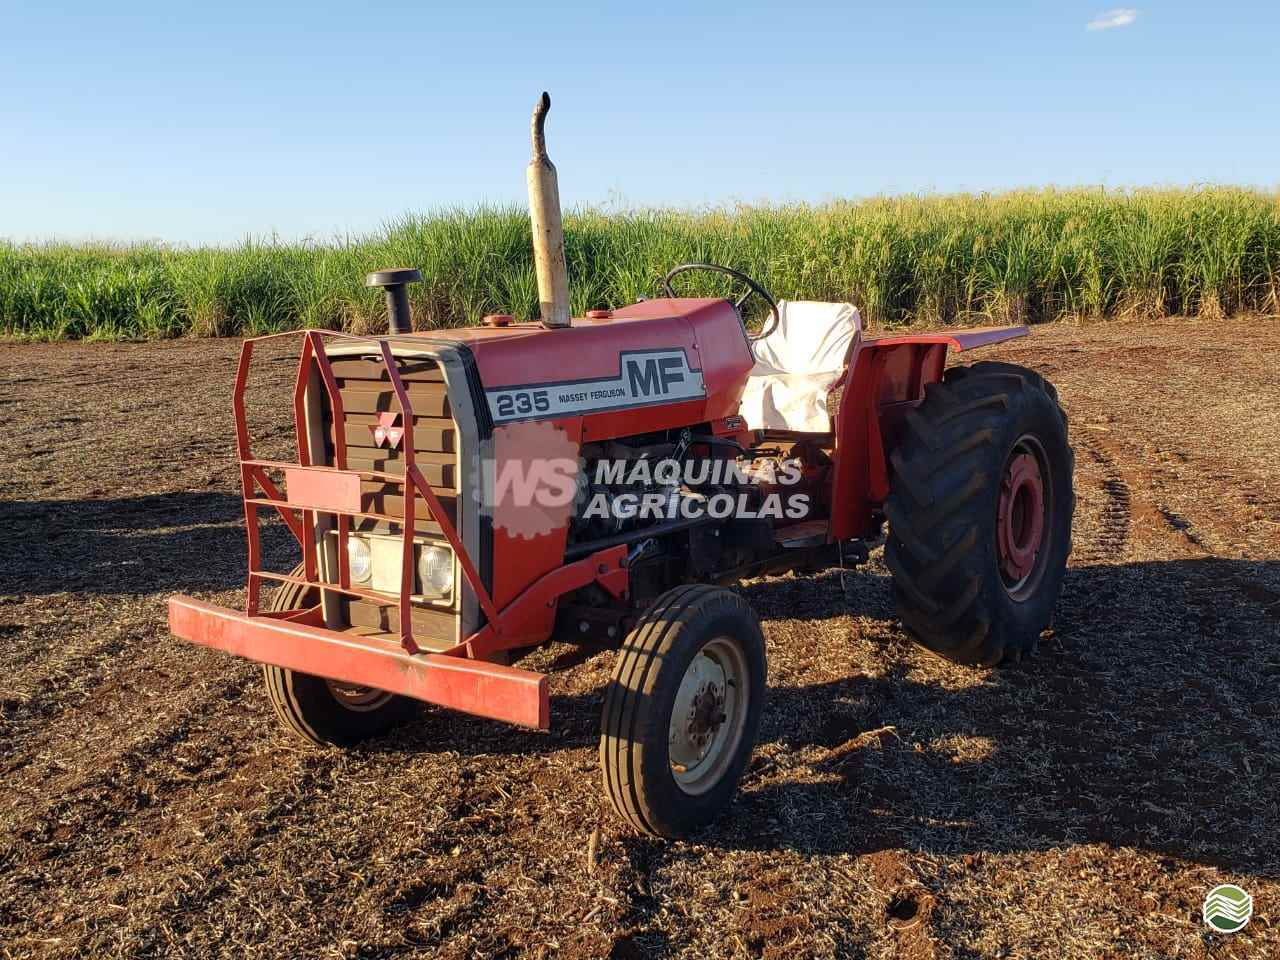 MASSEY FERGUSON MF 235  1981/1981 WS Máquinas Agrícolas